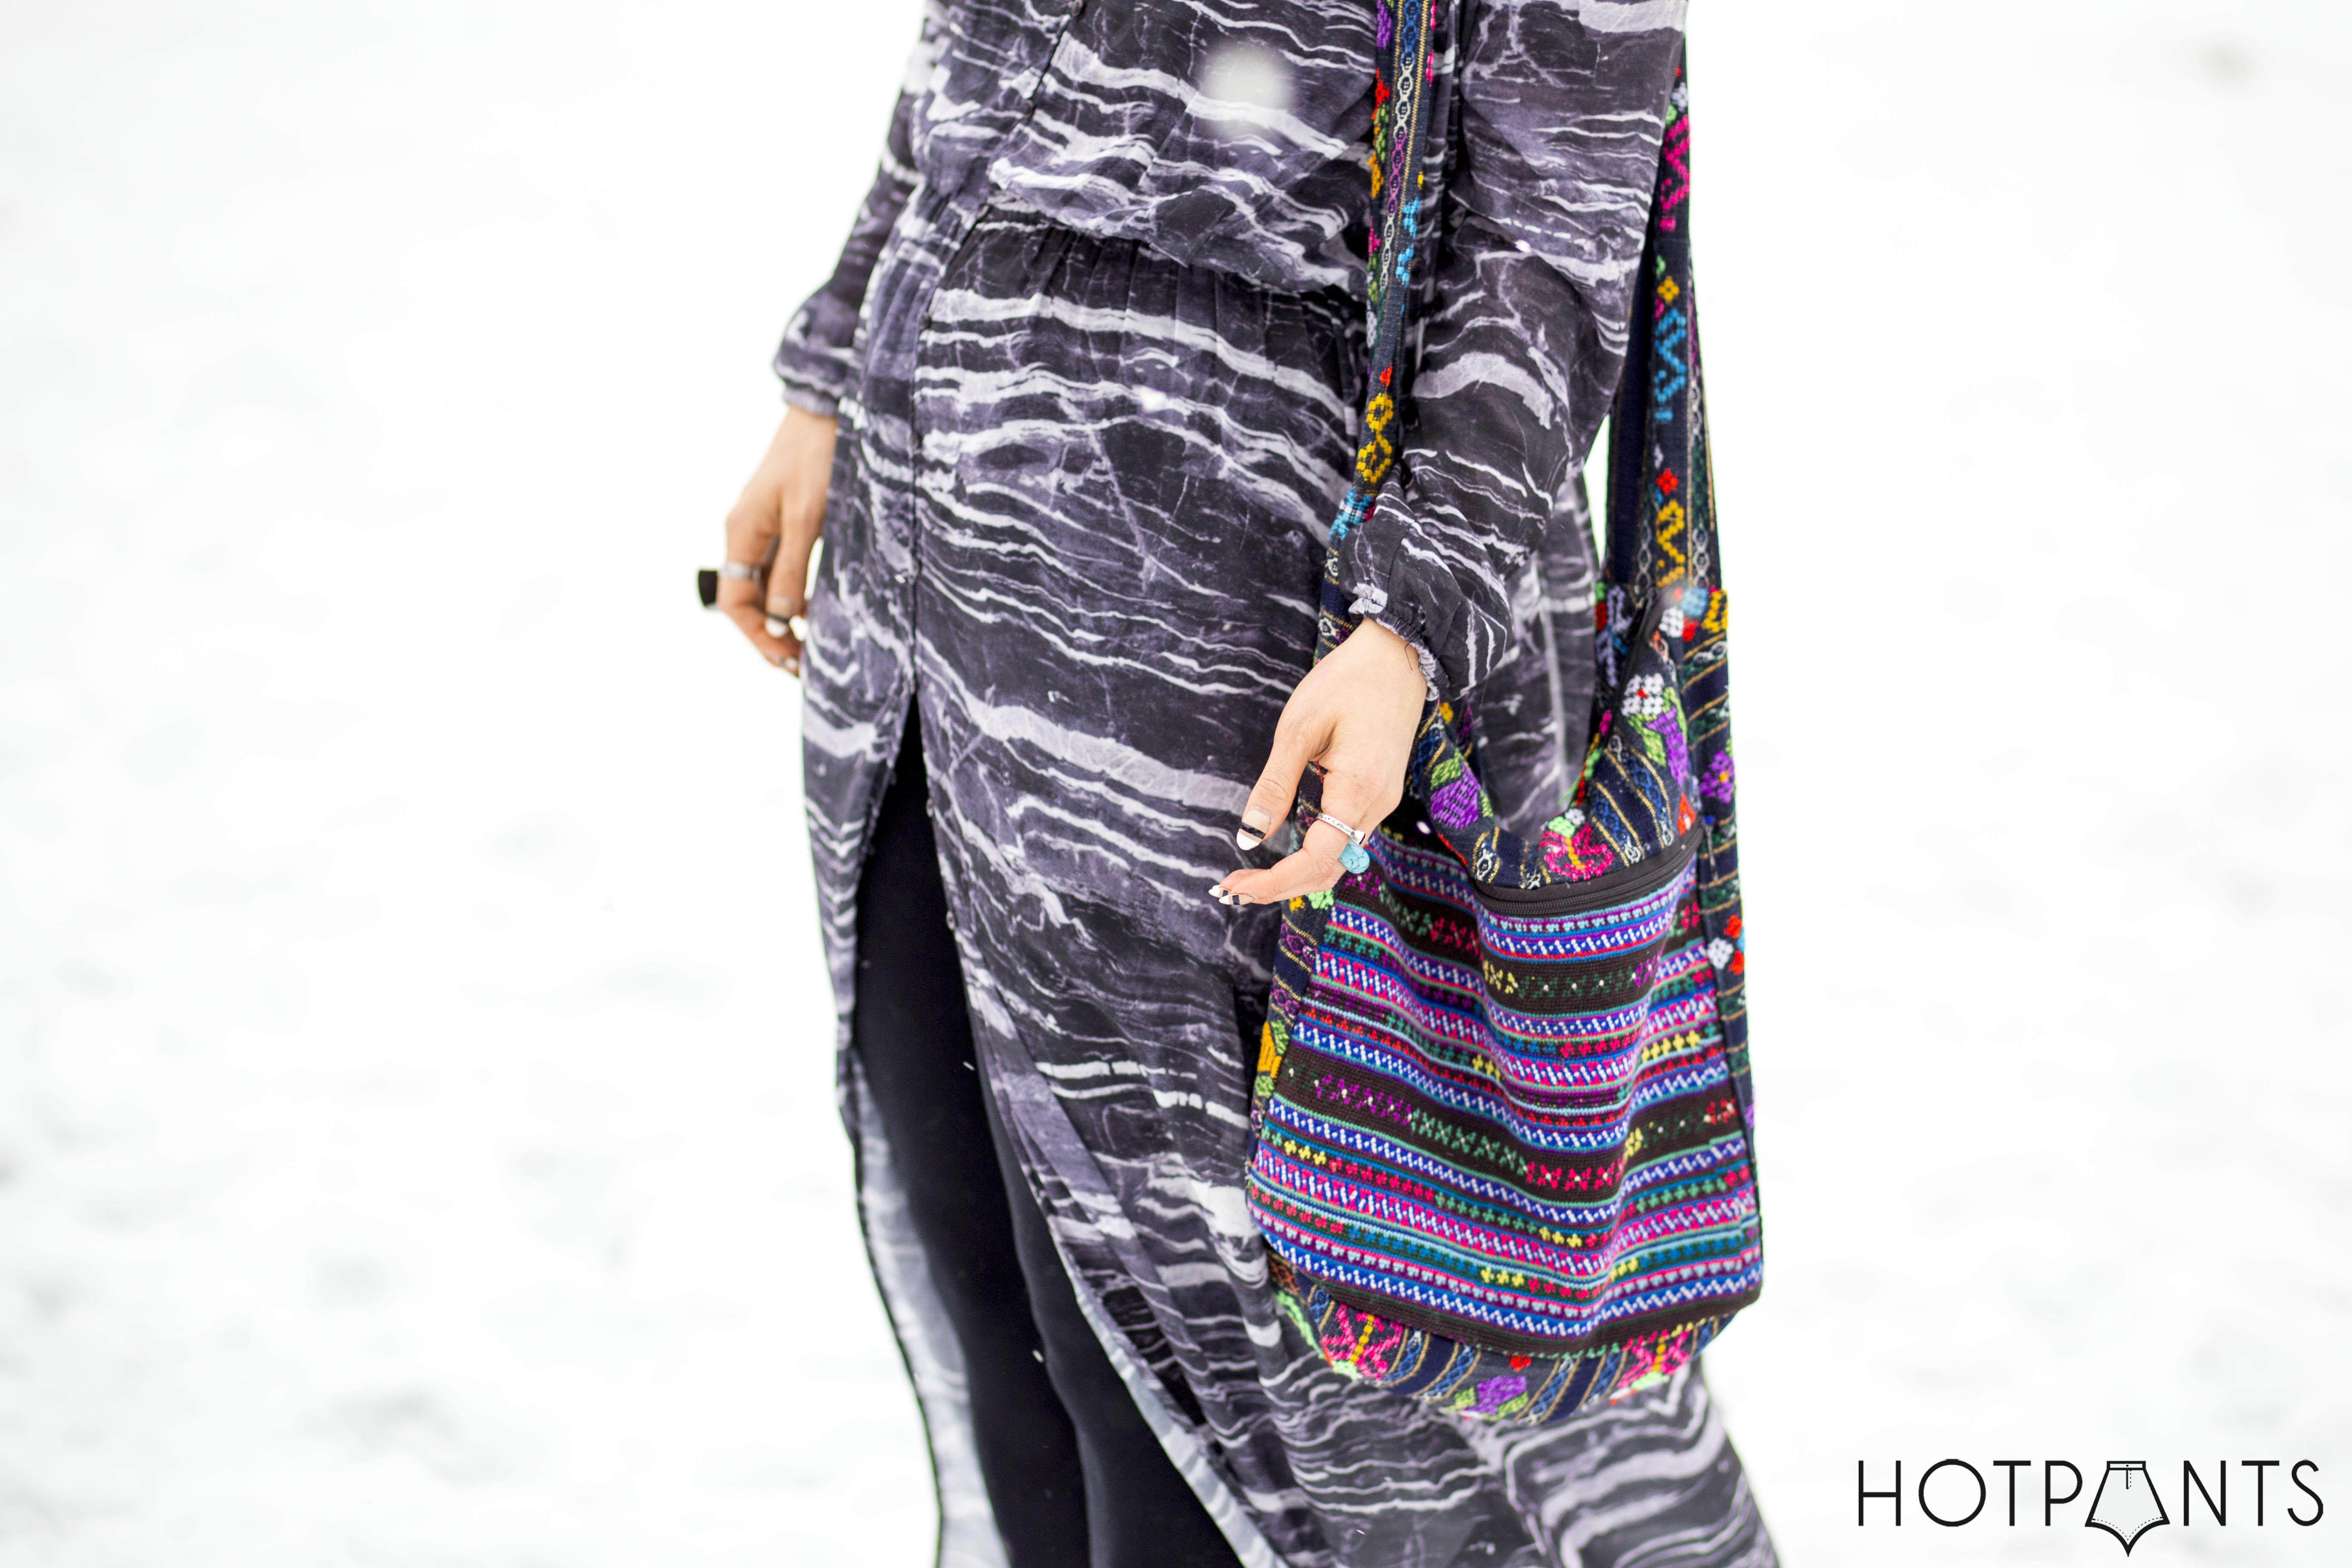 Long Hair Blogger Updo Bun Tie Dye Maxi Sheer Dress